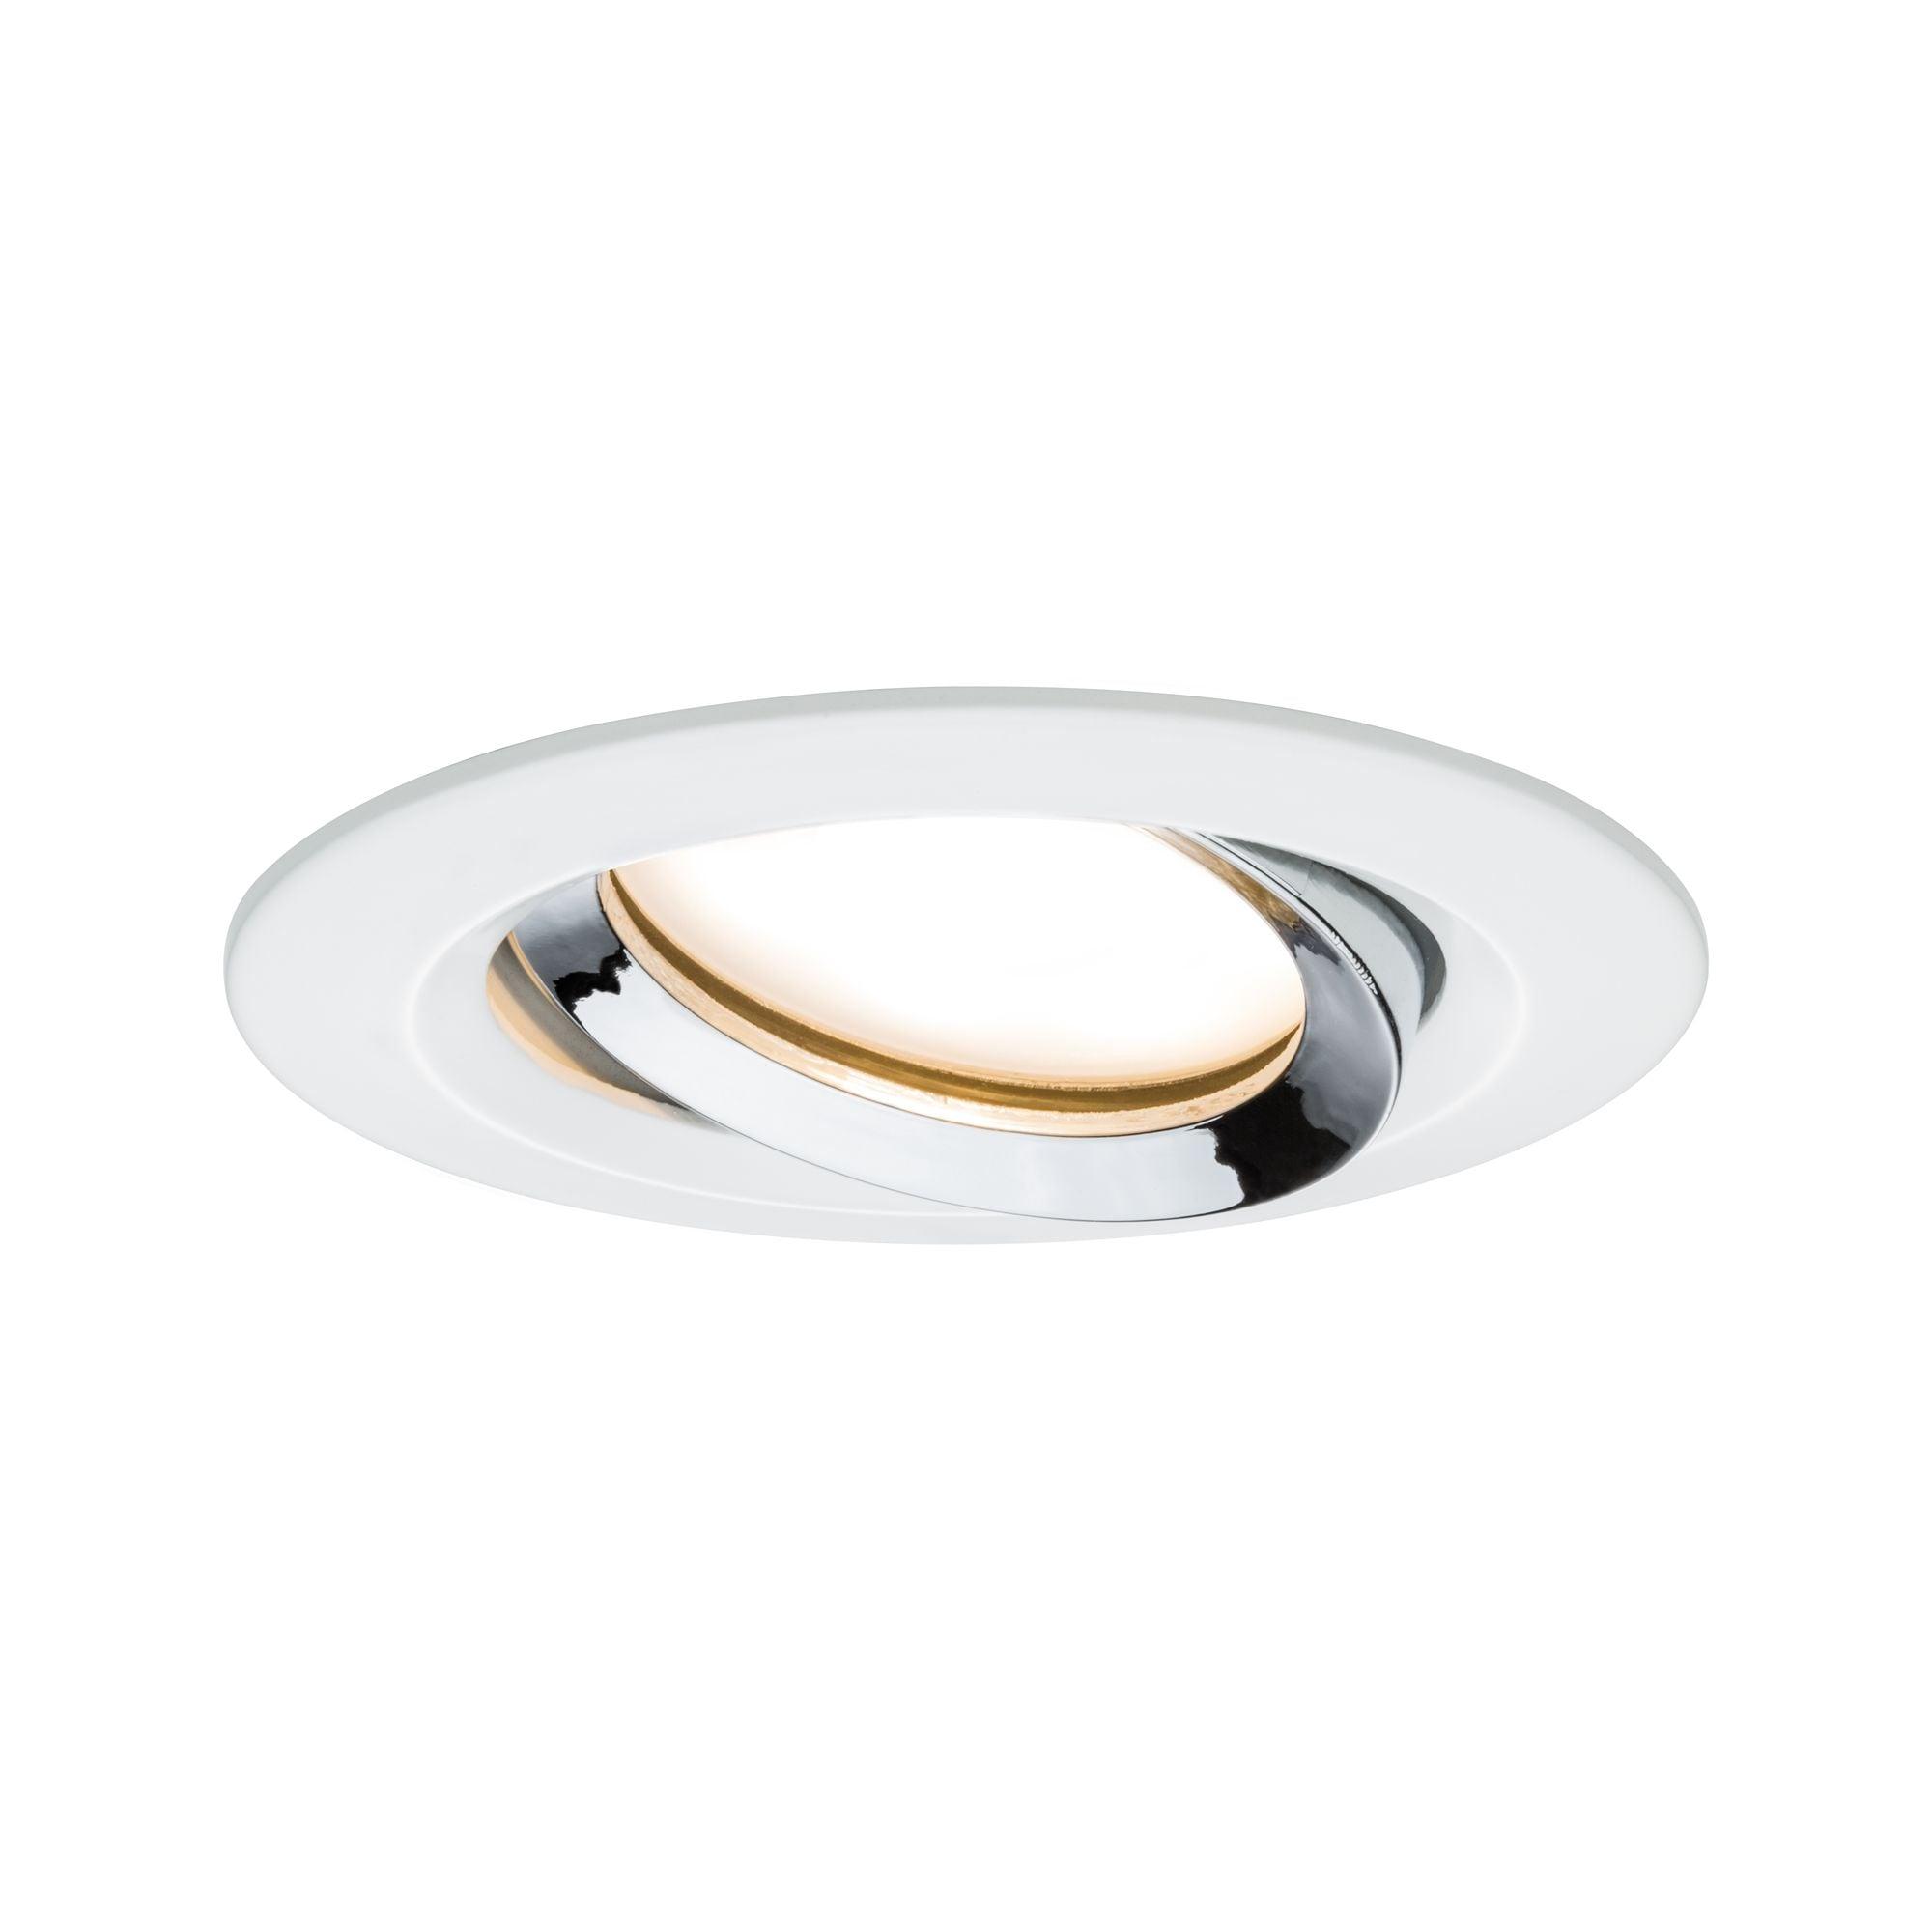 Paulmann LED Einbaustrahler dimmbar schwenkbar rund Weiß matt Chrom 1x6,8W Nova Plus, 1 St., Warmweiß